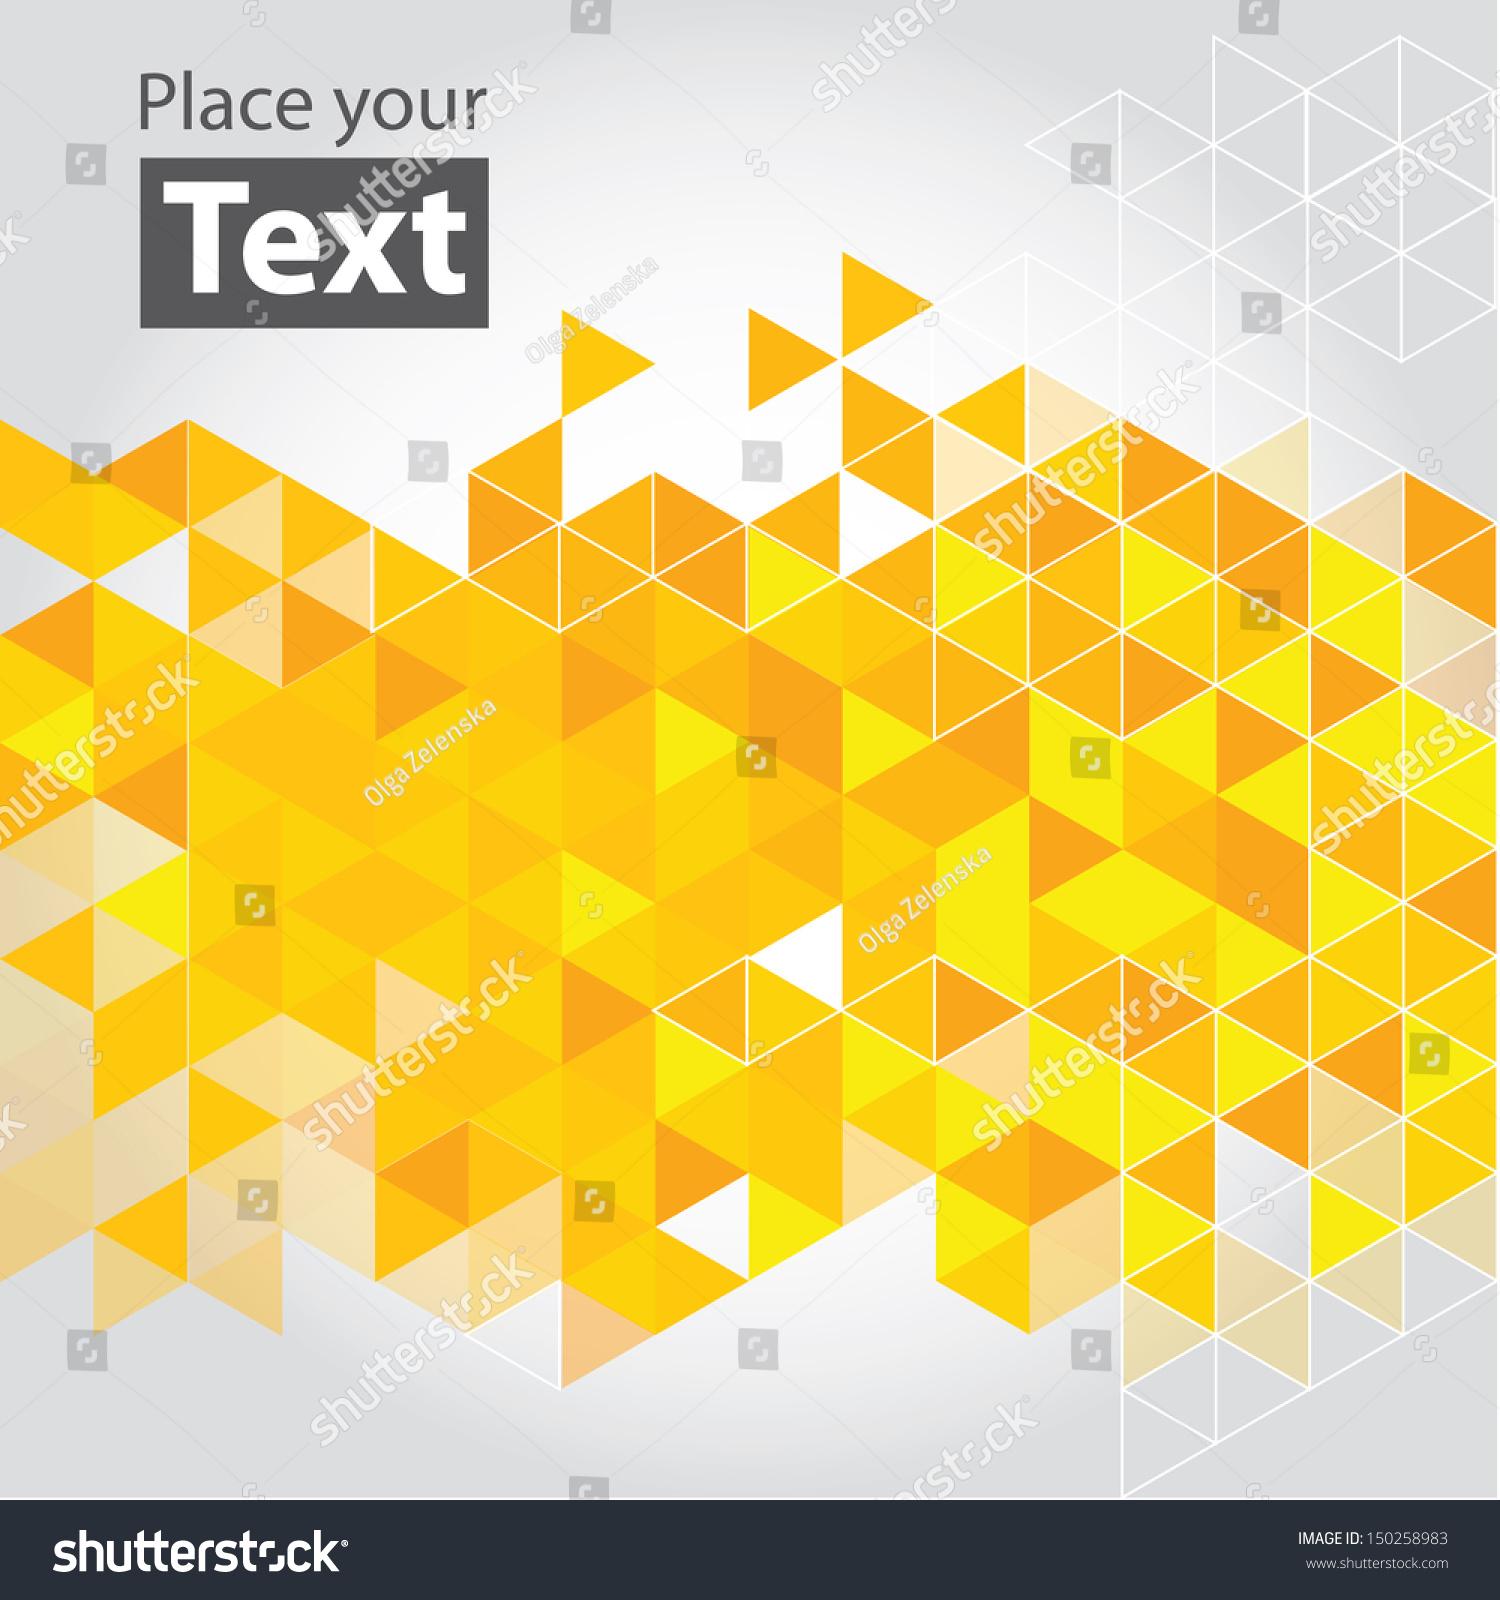 geometric yellow background illustration - photo #5